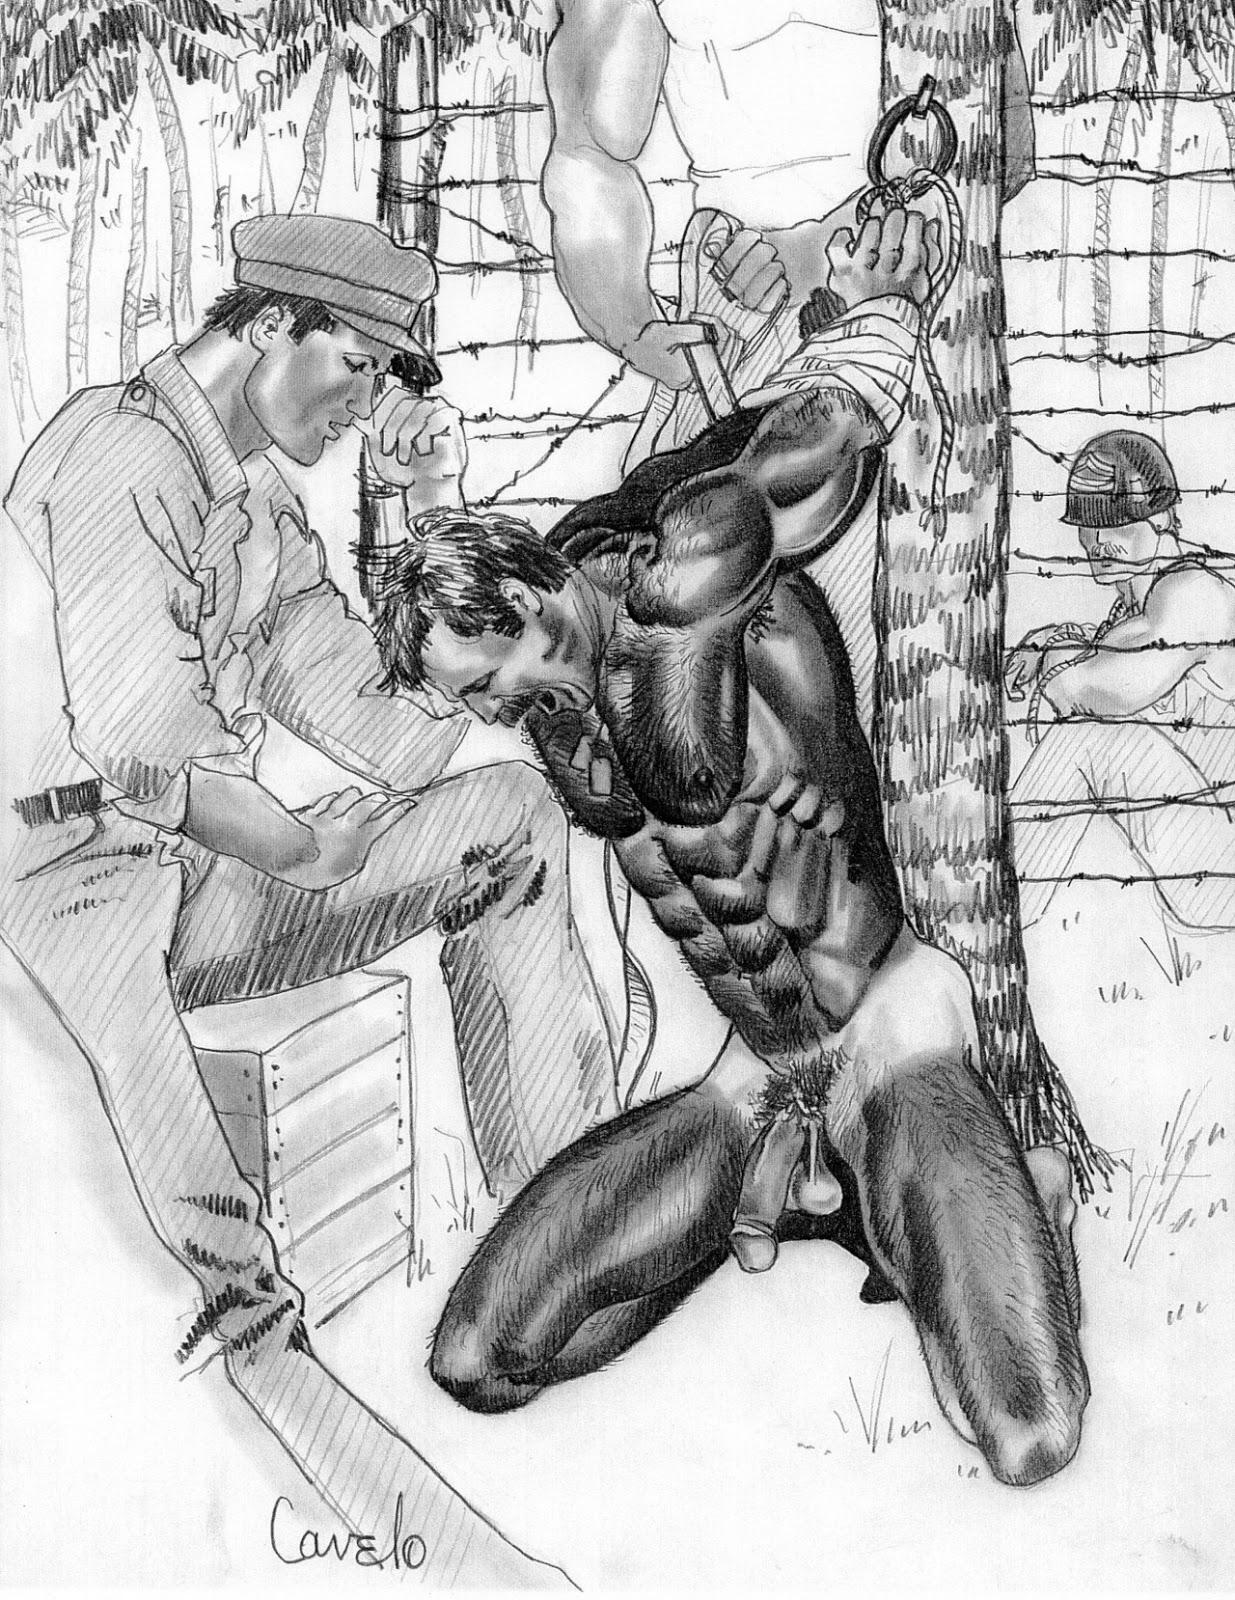 Japanese bondage torture drawings - Other